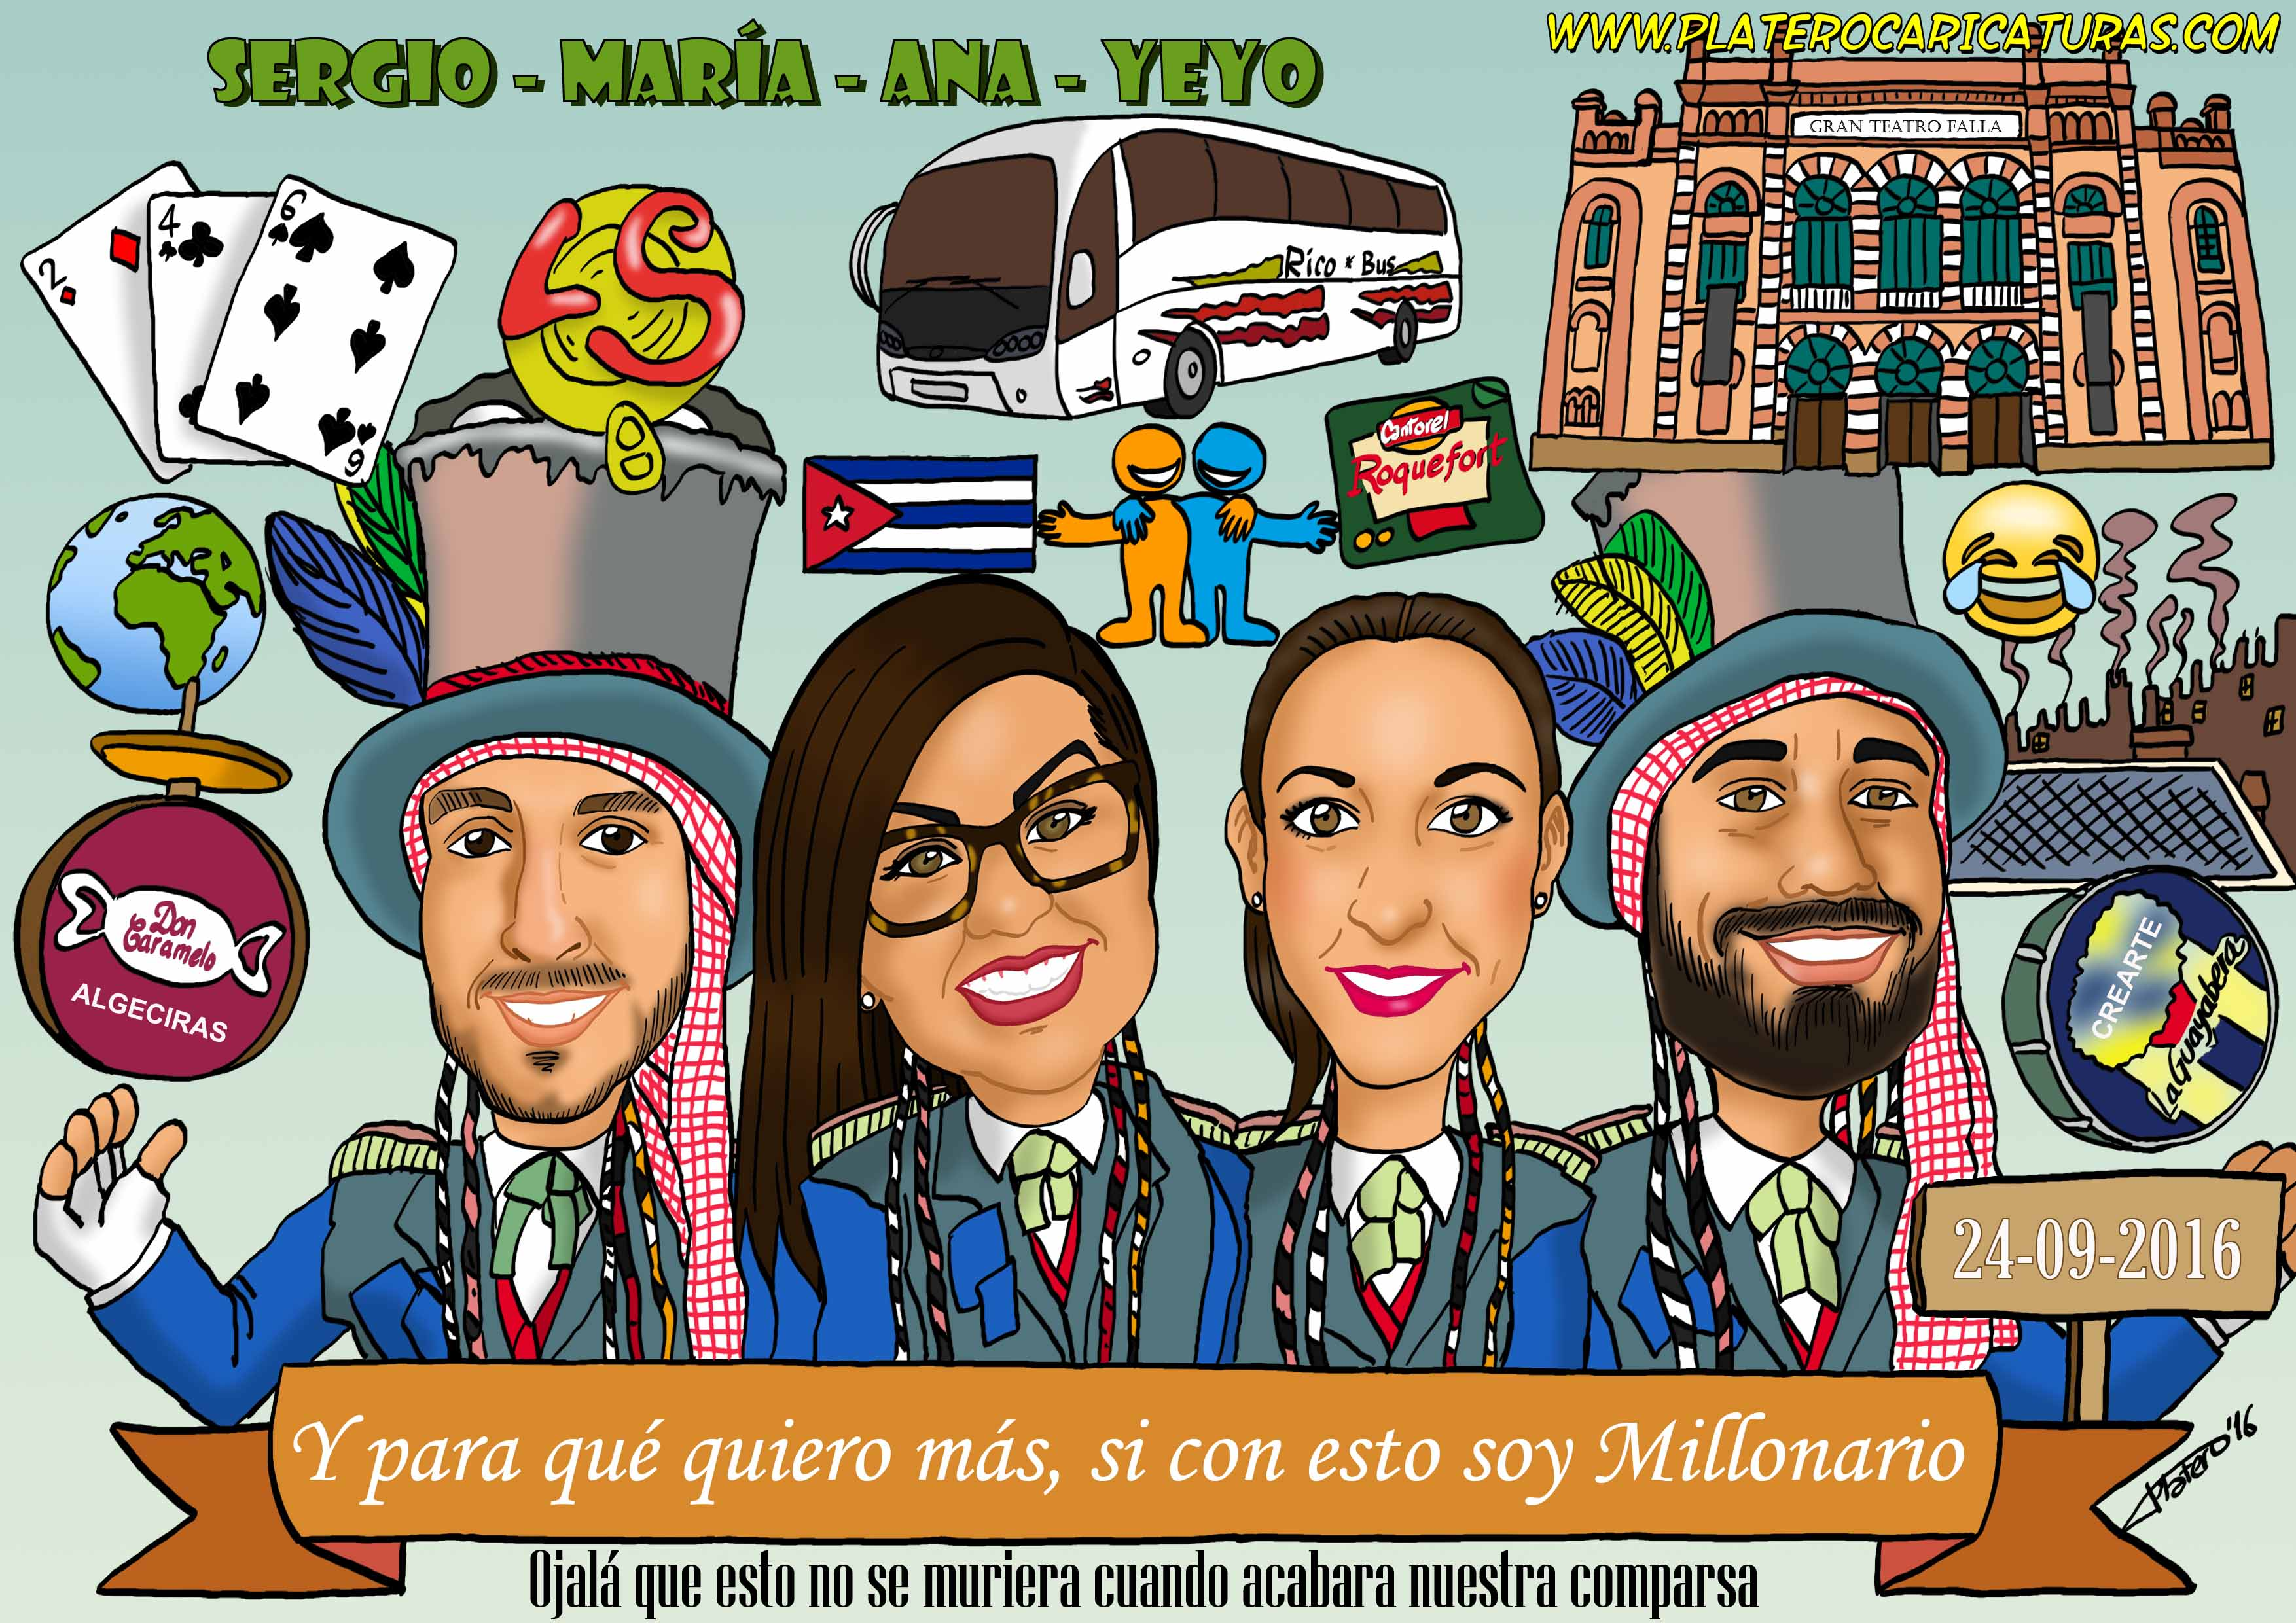 caricaturas_4 chicos carnaval_platerocaricaturas